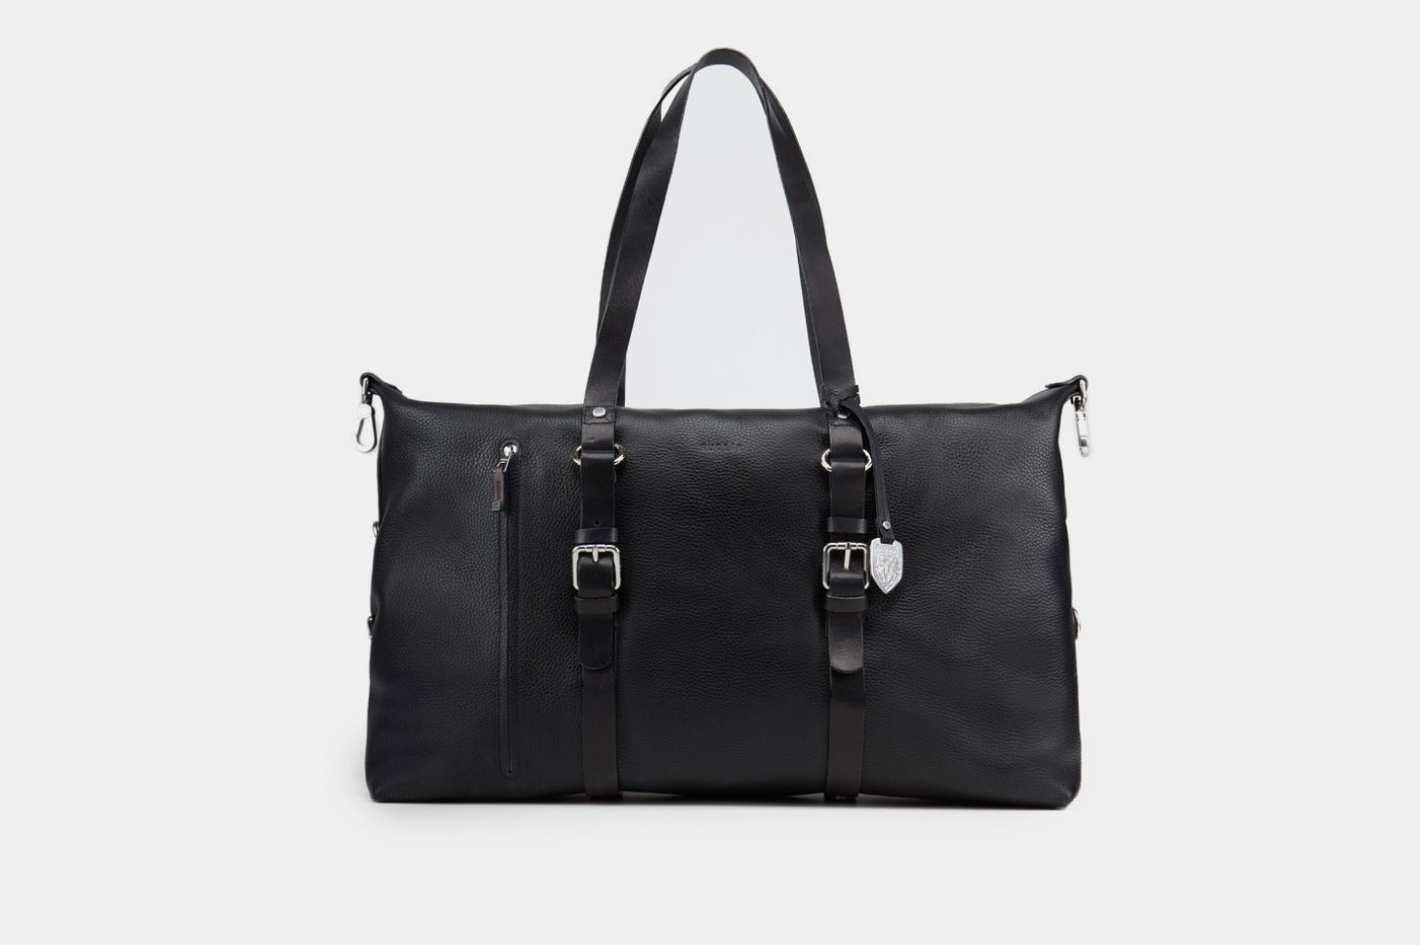 Rudsak Rick Leather Travel Bag